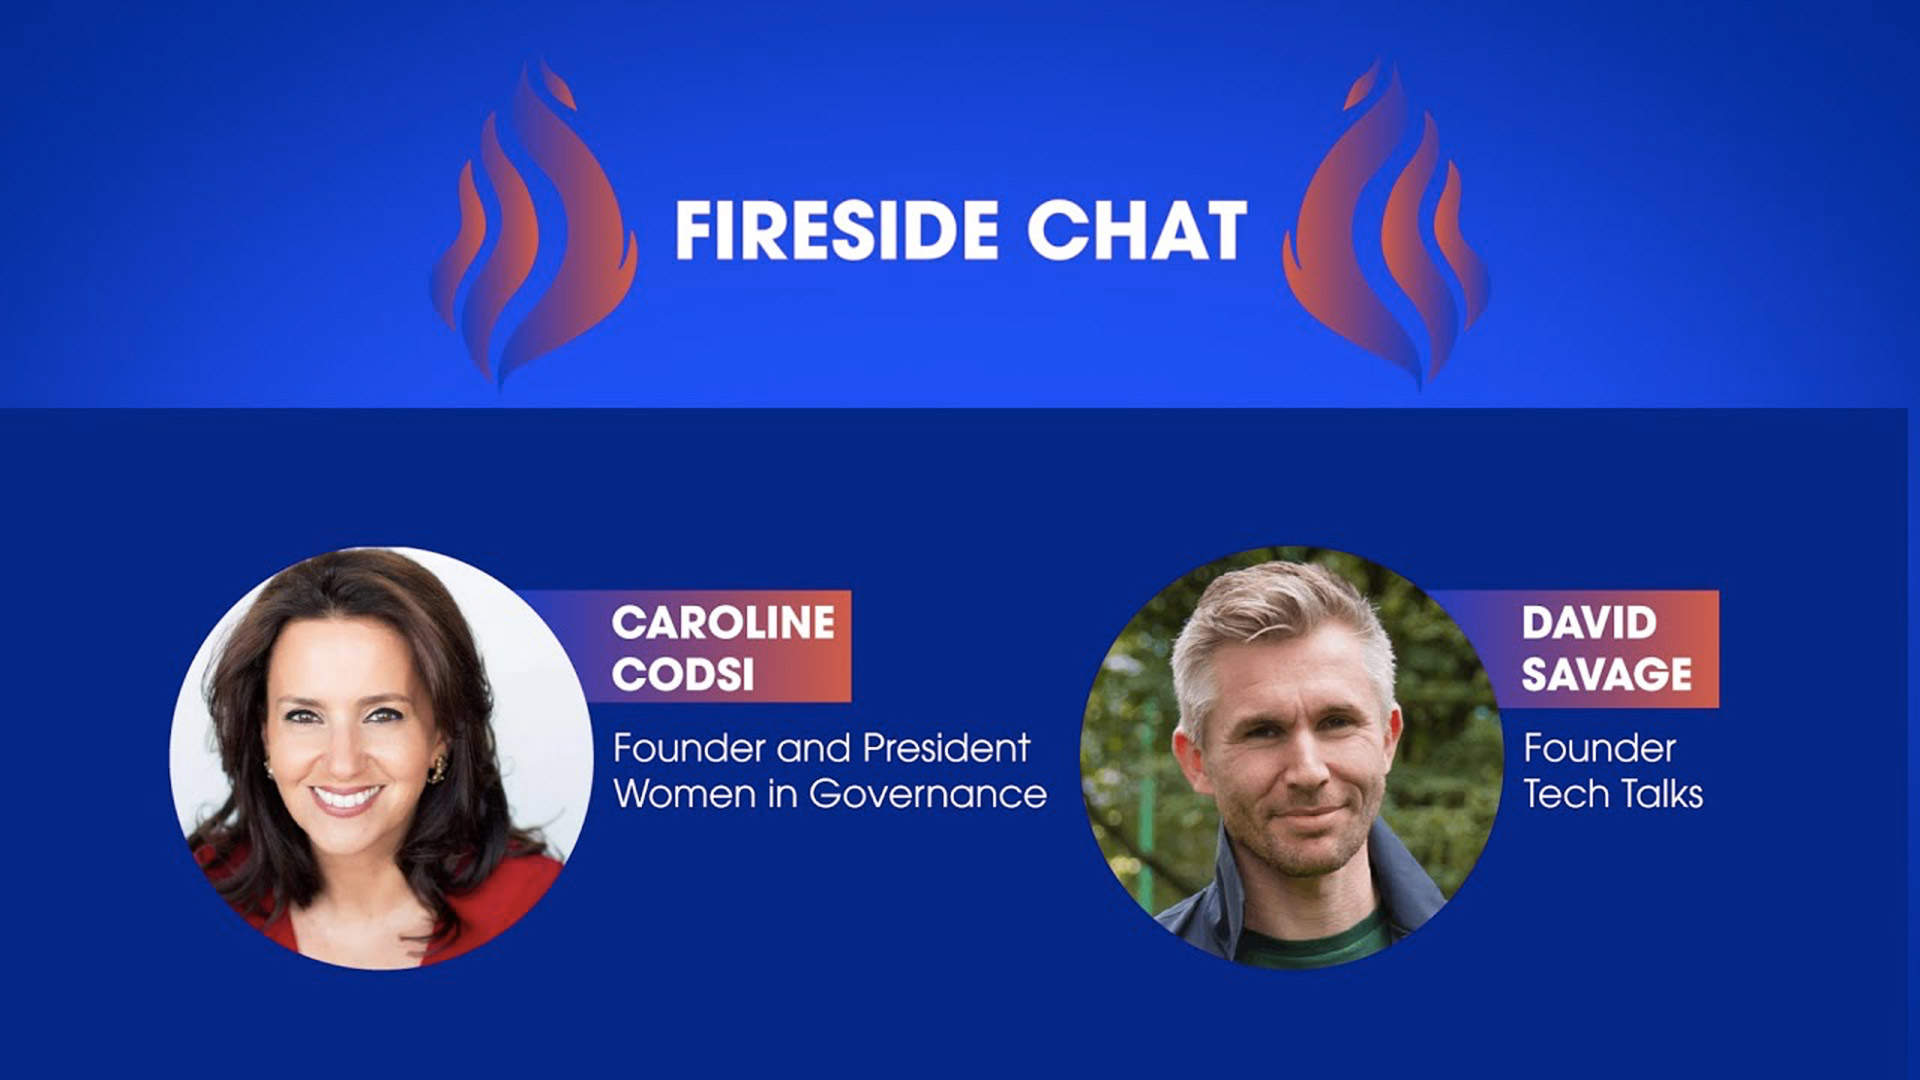 Fireside Chat with Caroline Codsi and David Savage